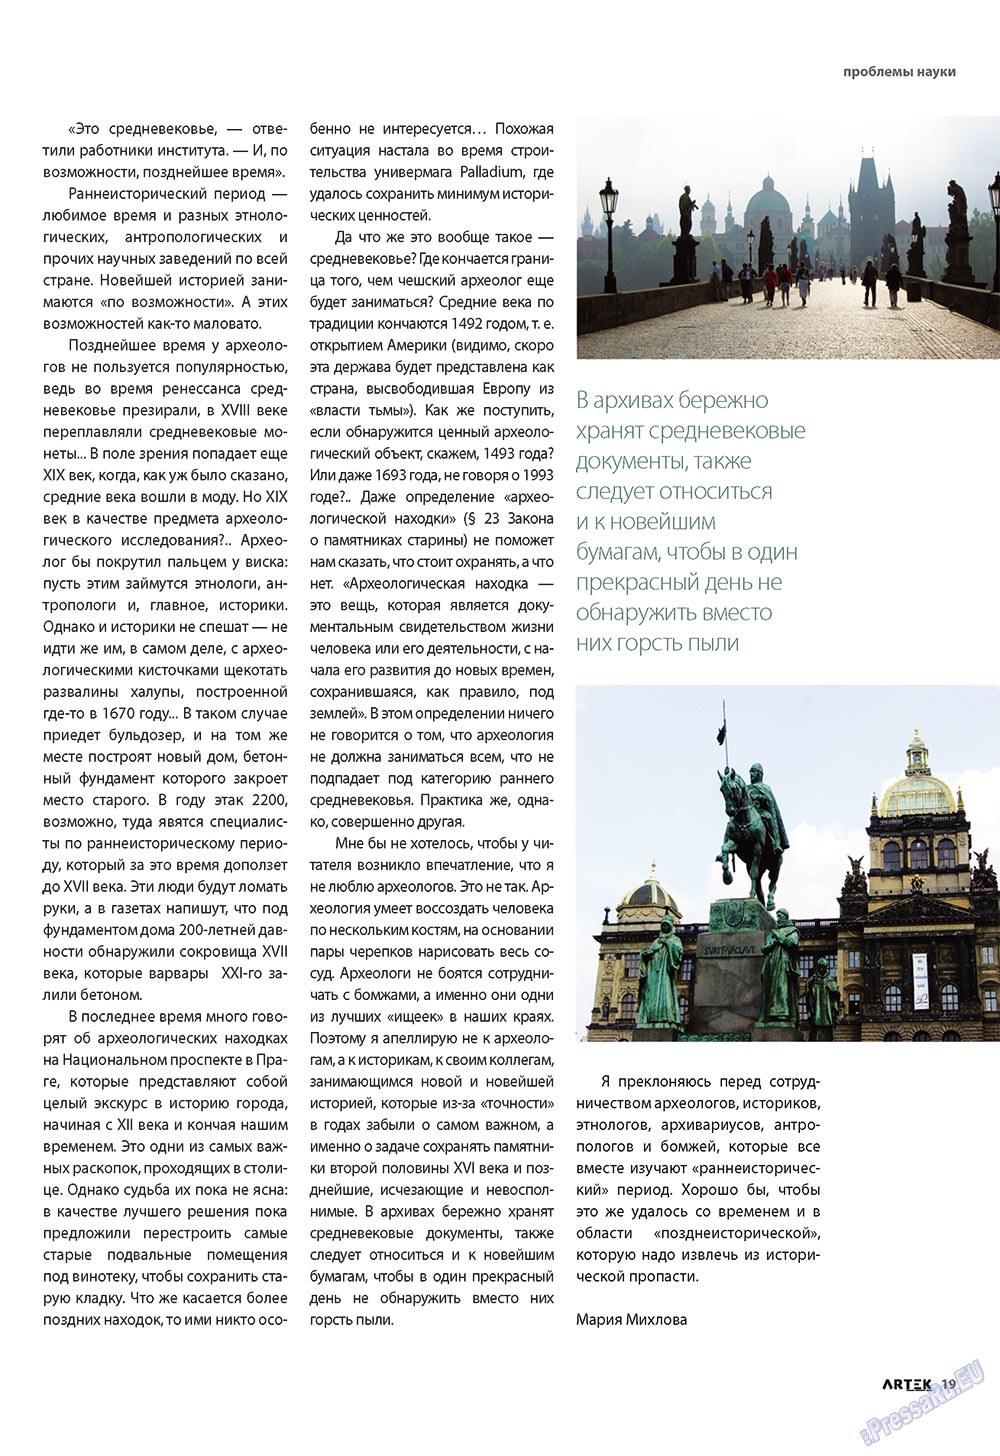 Артек (журнал). 2009 год, номер 6, стр. 21